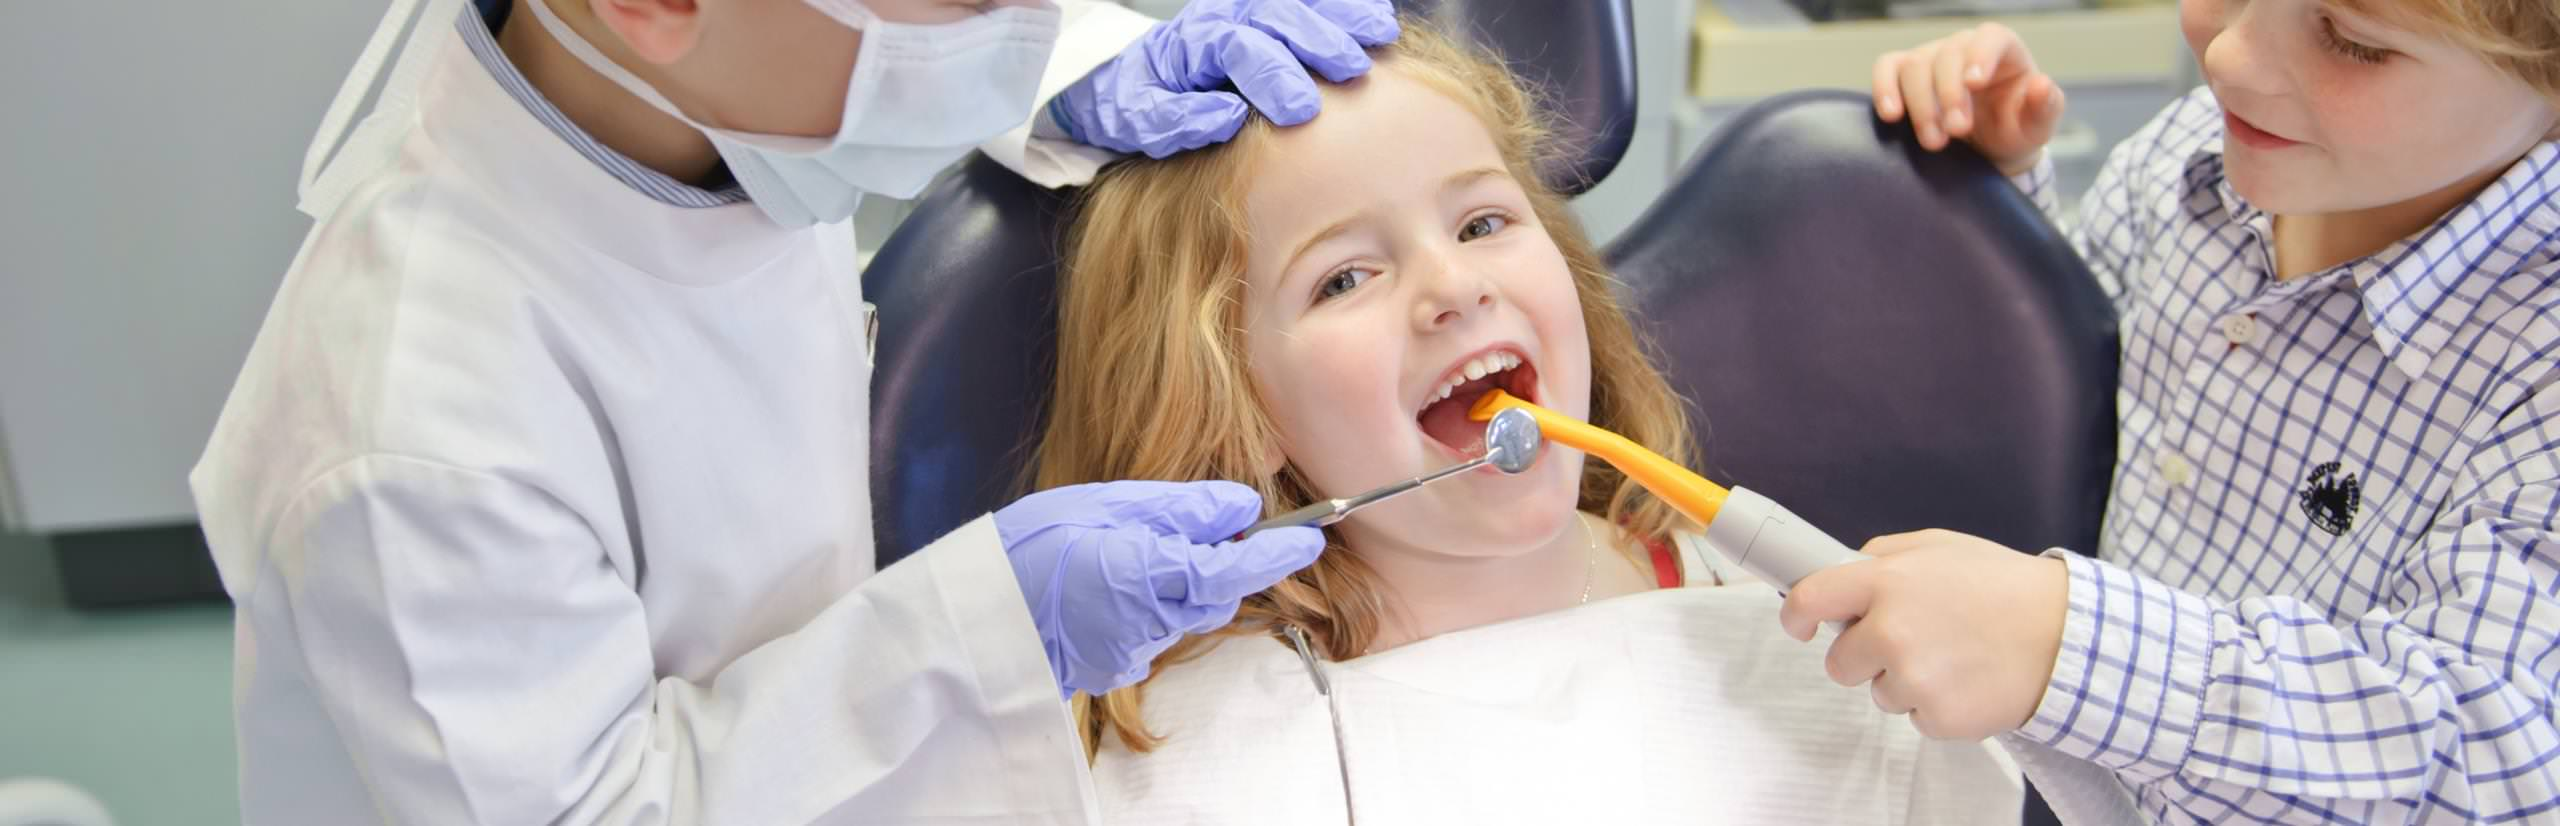 Praxis-Marketing Zahnarzt Kinderbehandlung